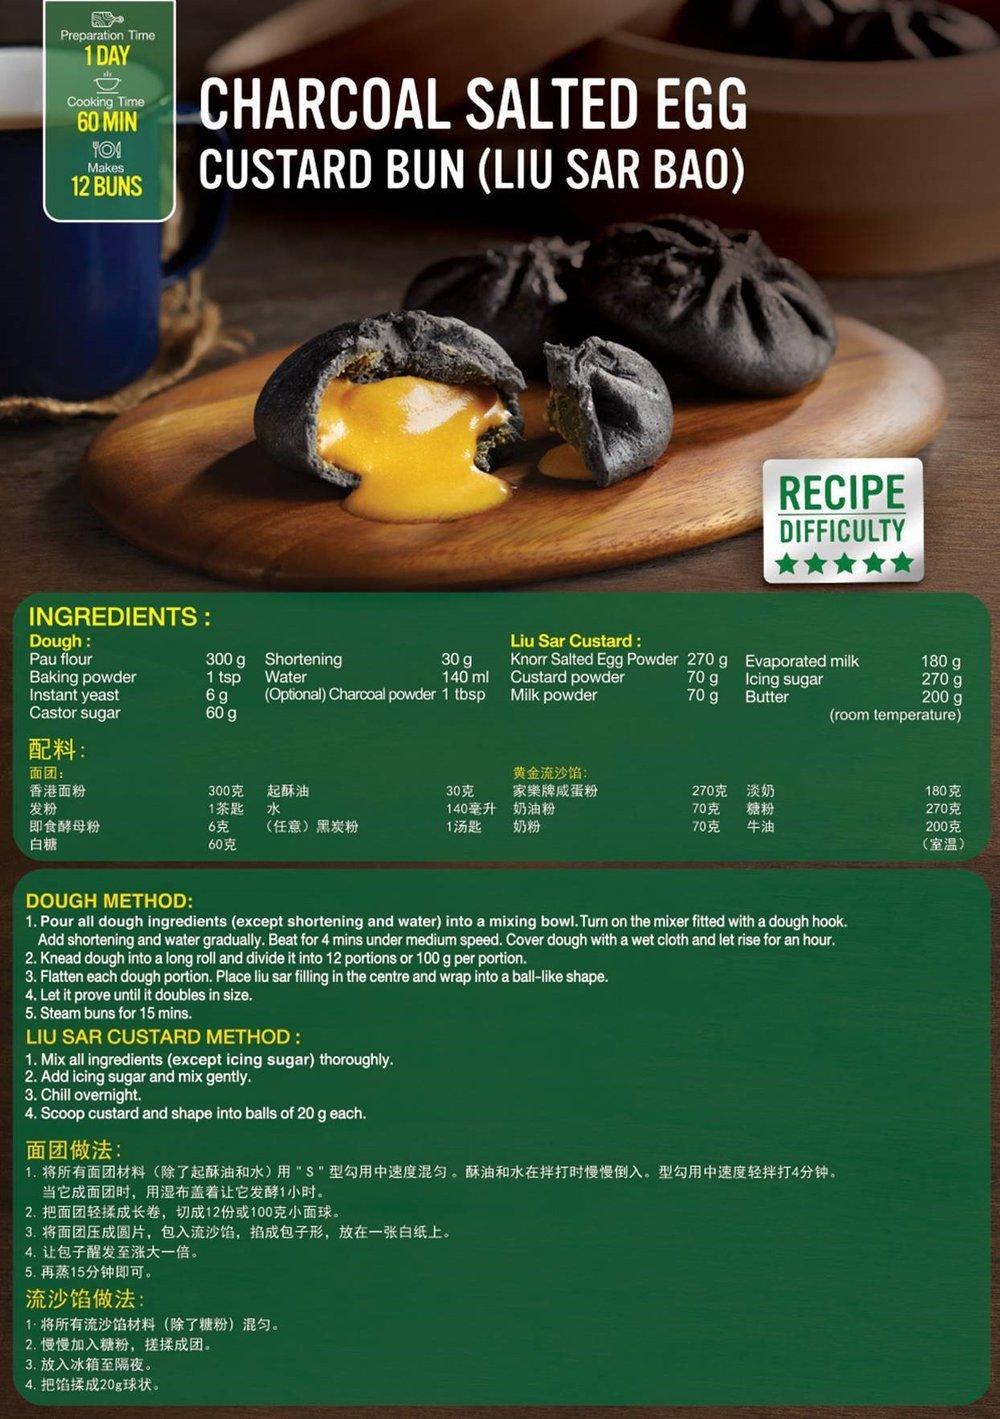 Knorr Salted Egg Recipe - Charcoal Custard Bun.jpg